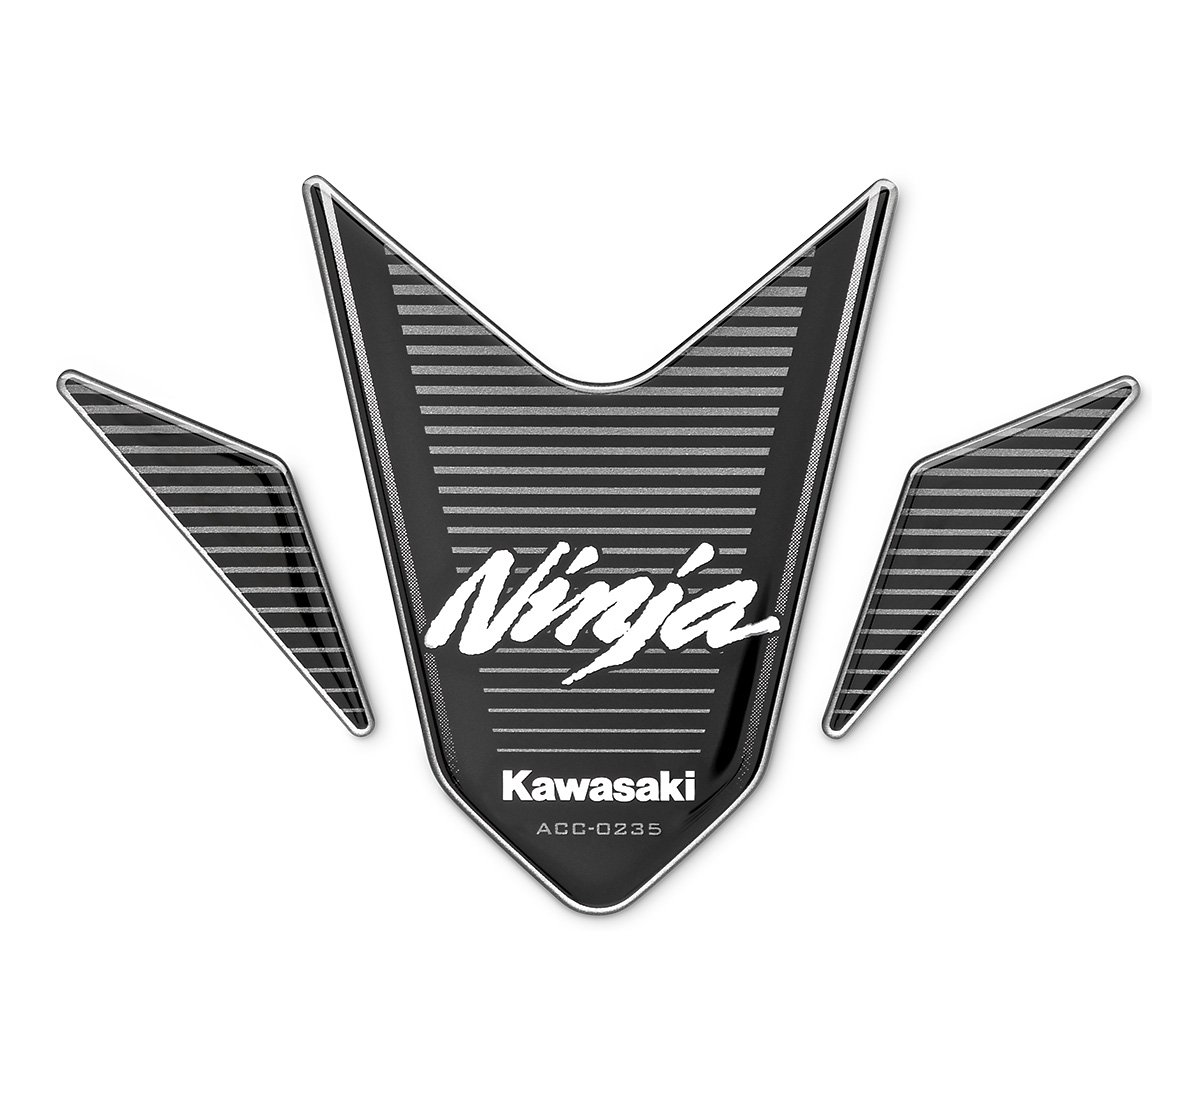 Amazon.com: Kawasaki 2018 Ninja 400 tanque pad 99994 – 1039 ...